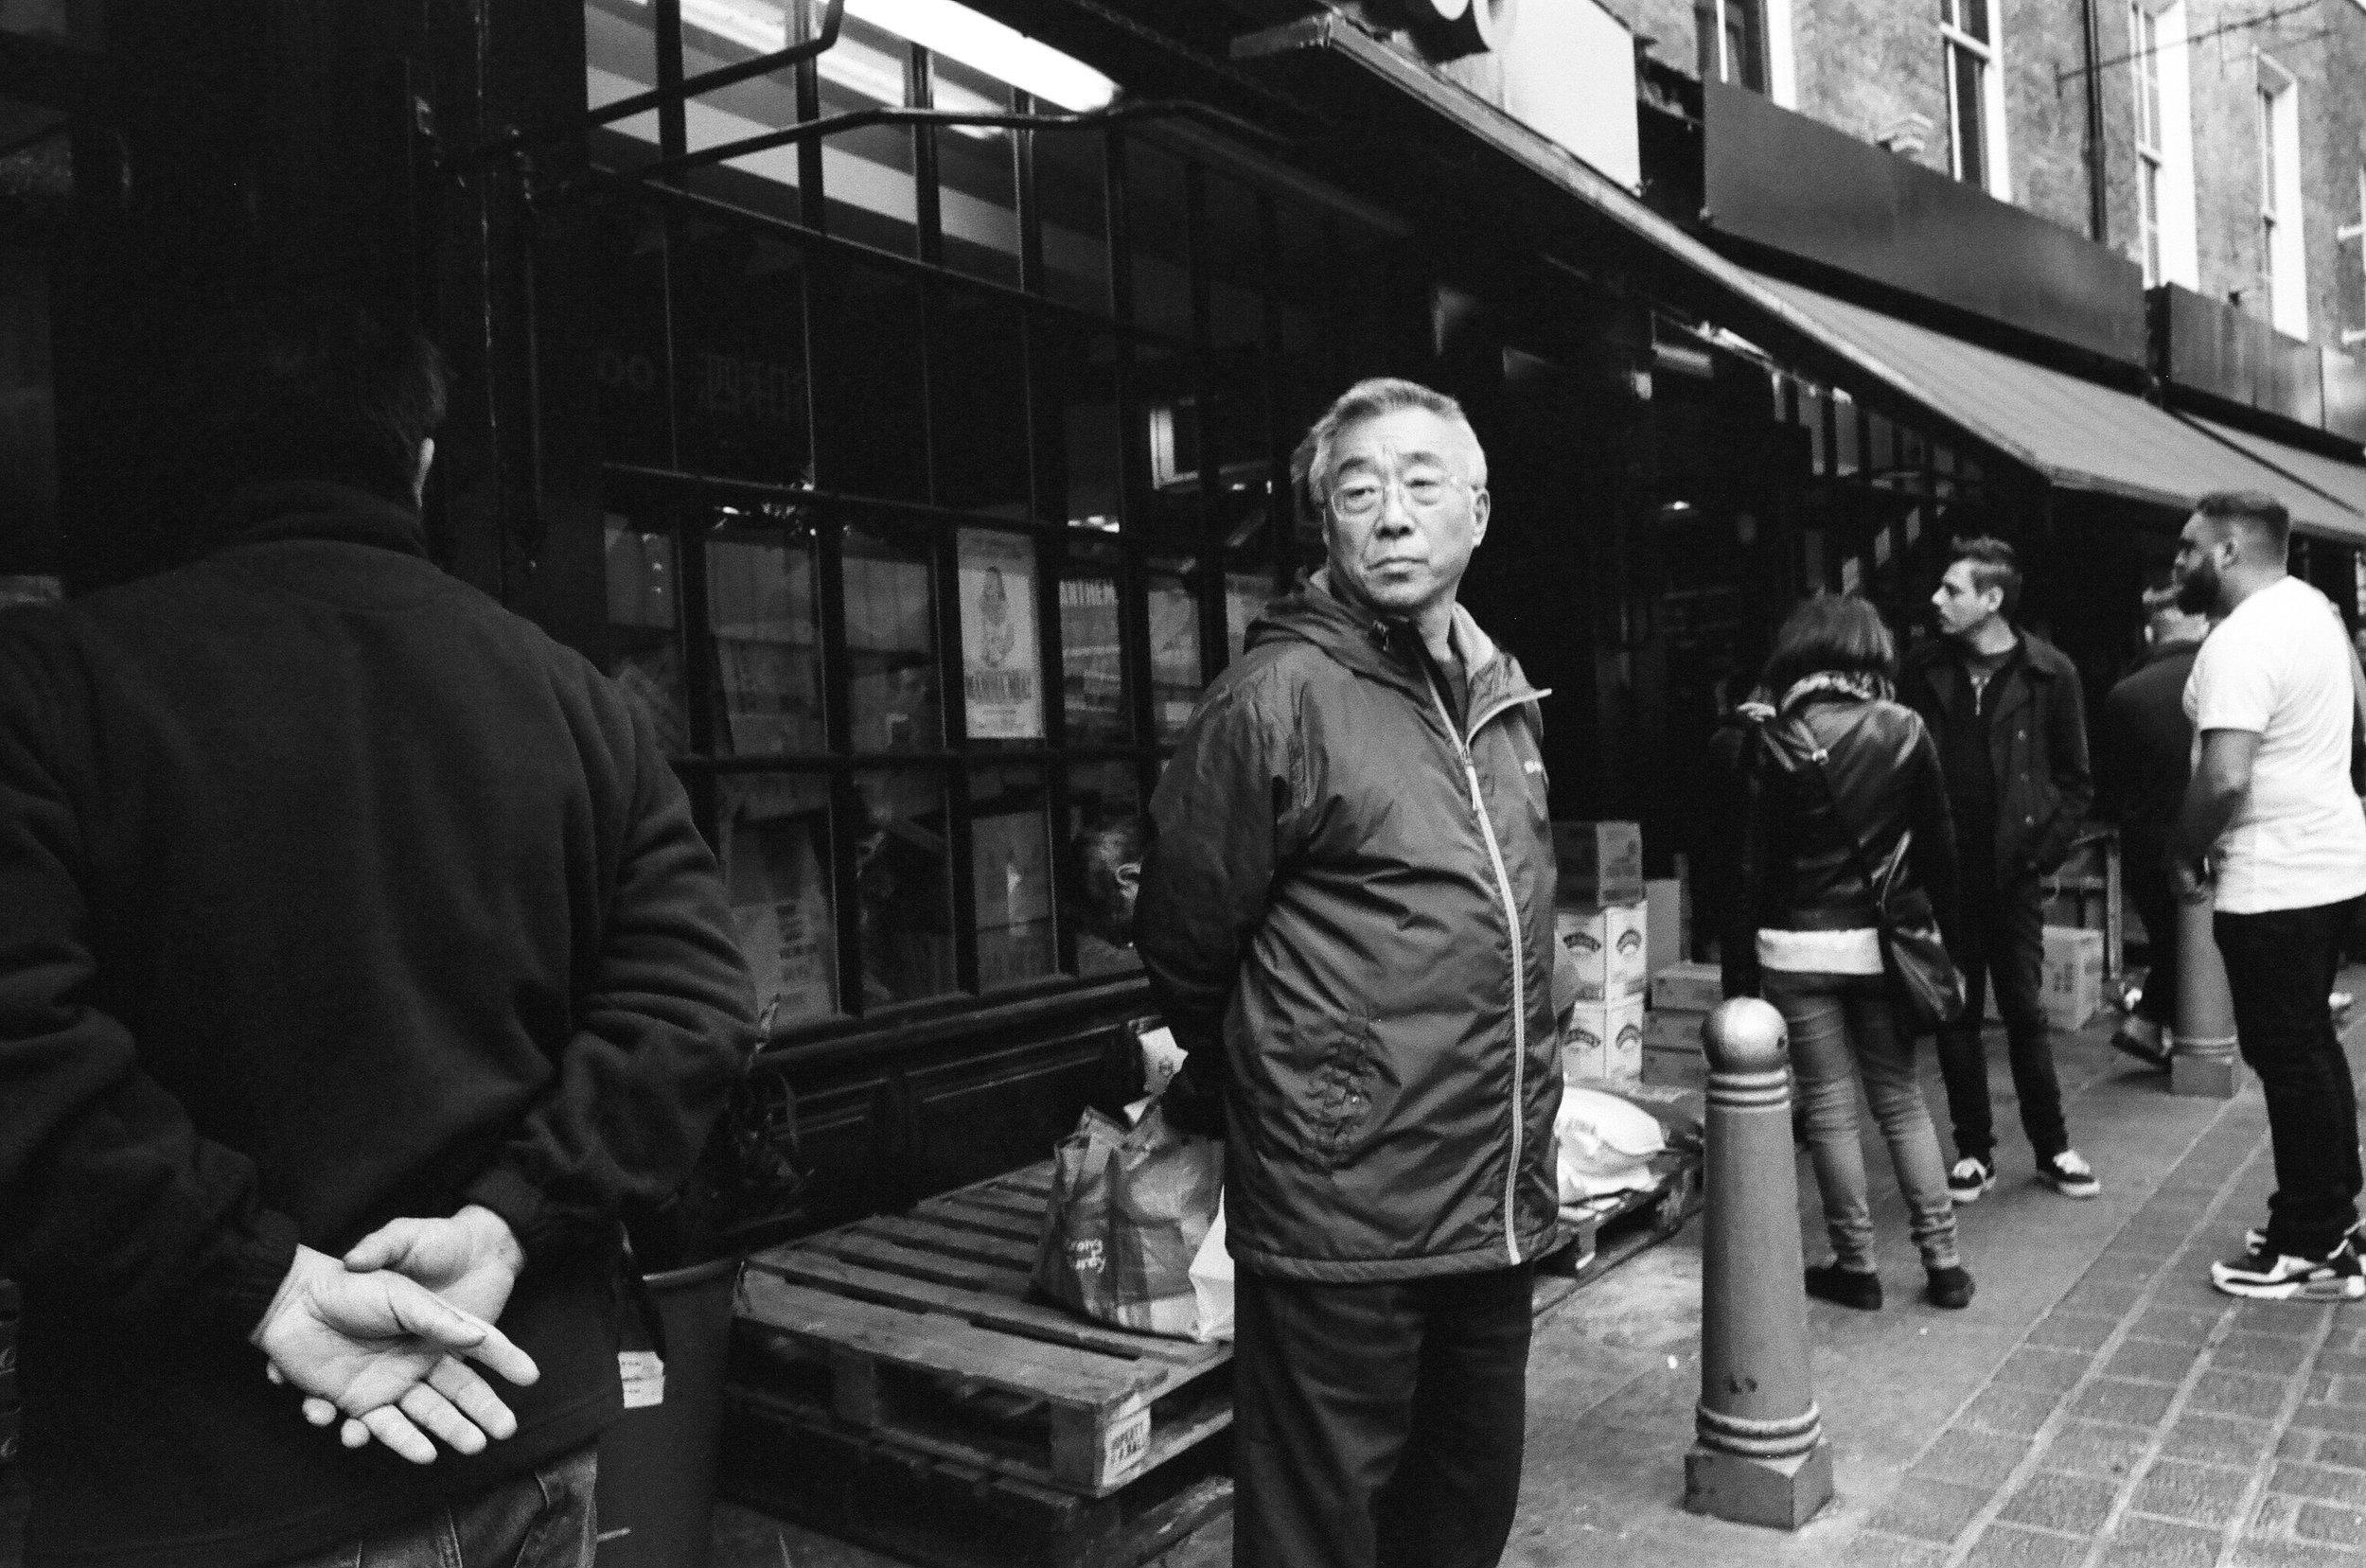 London (Leica M6 - Kodak 400TX)-46.jpg